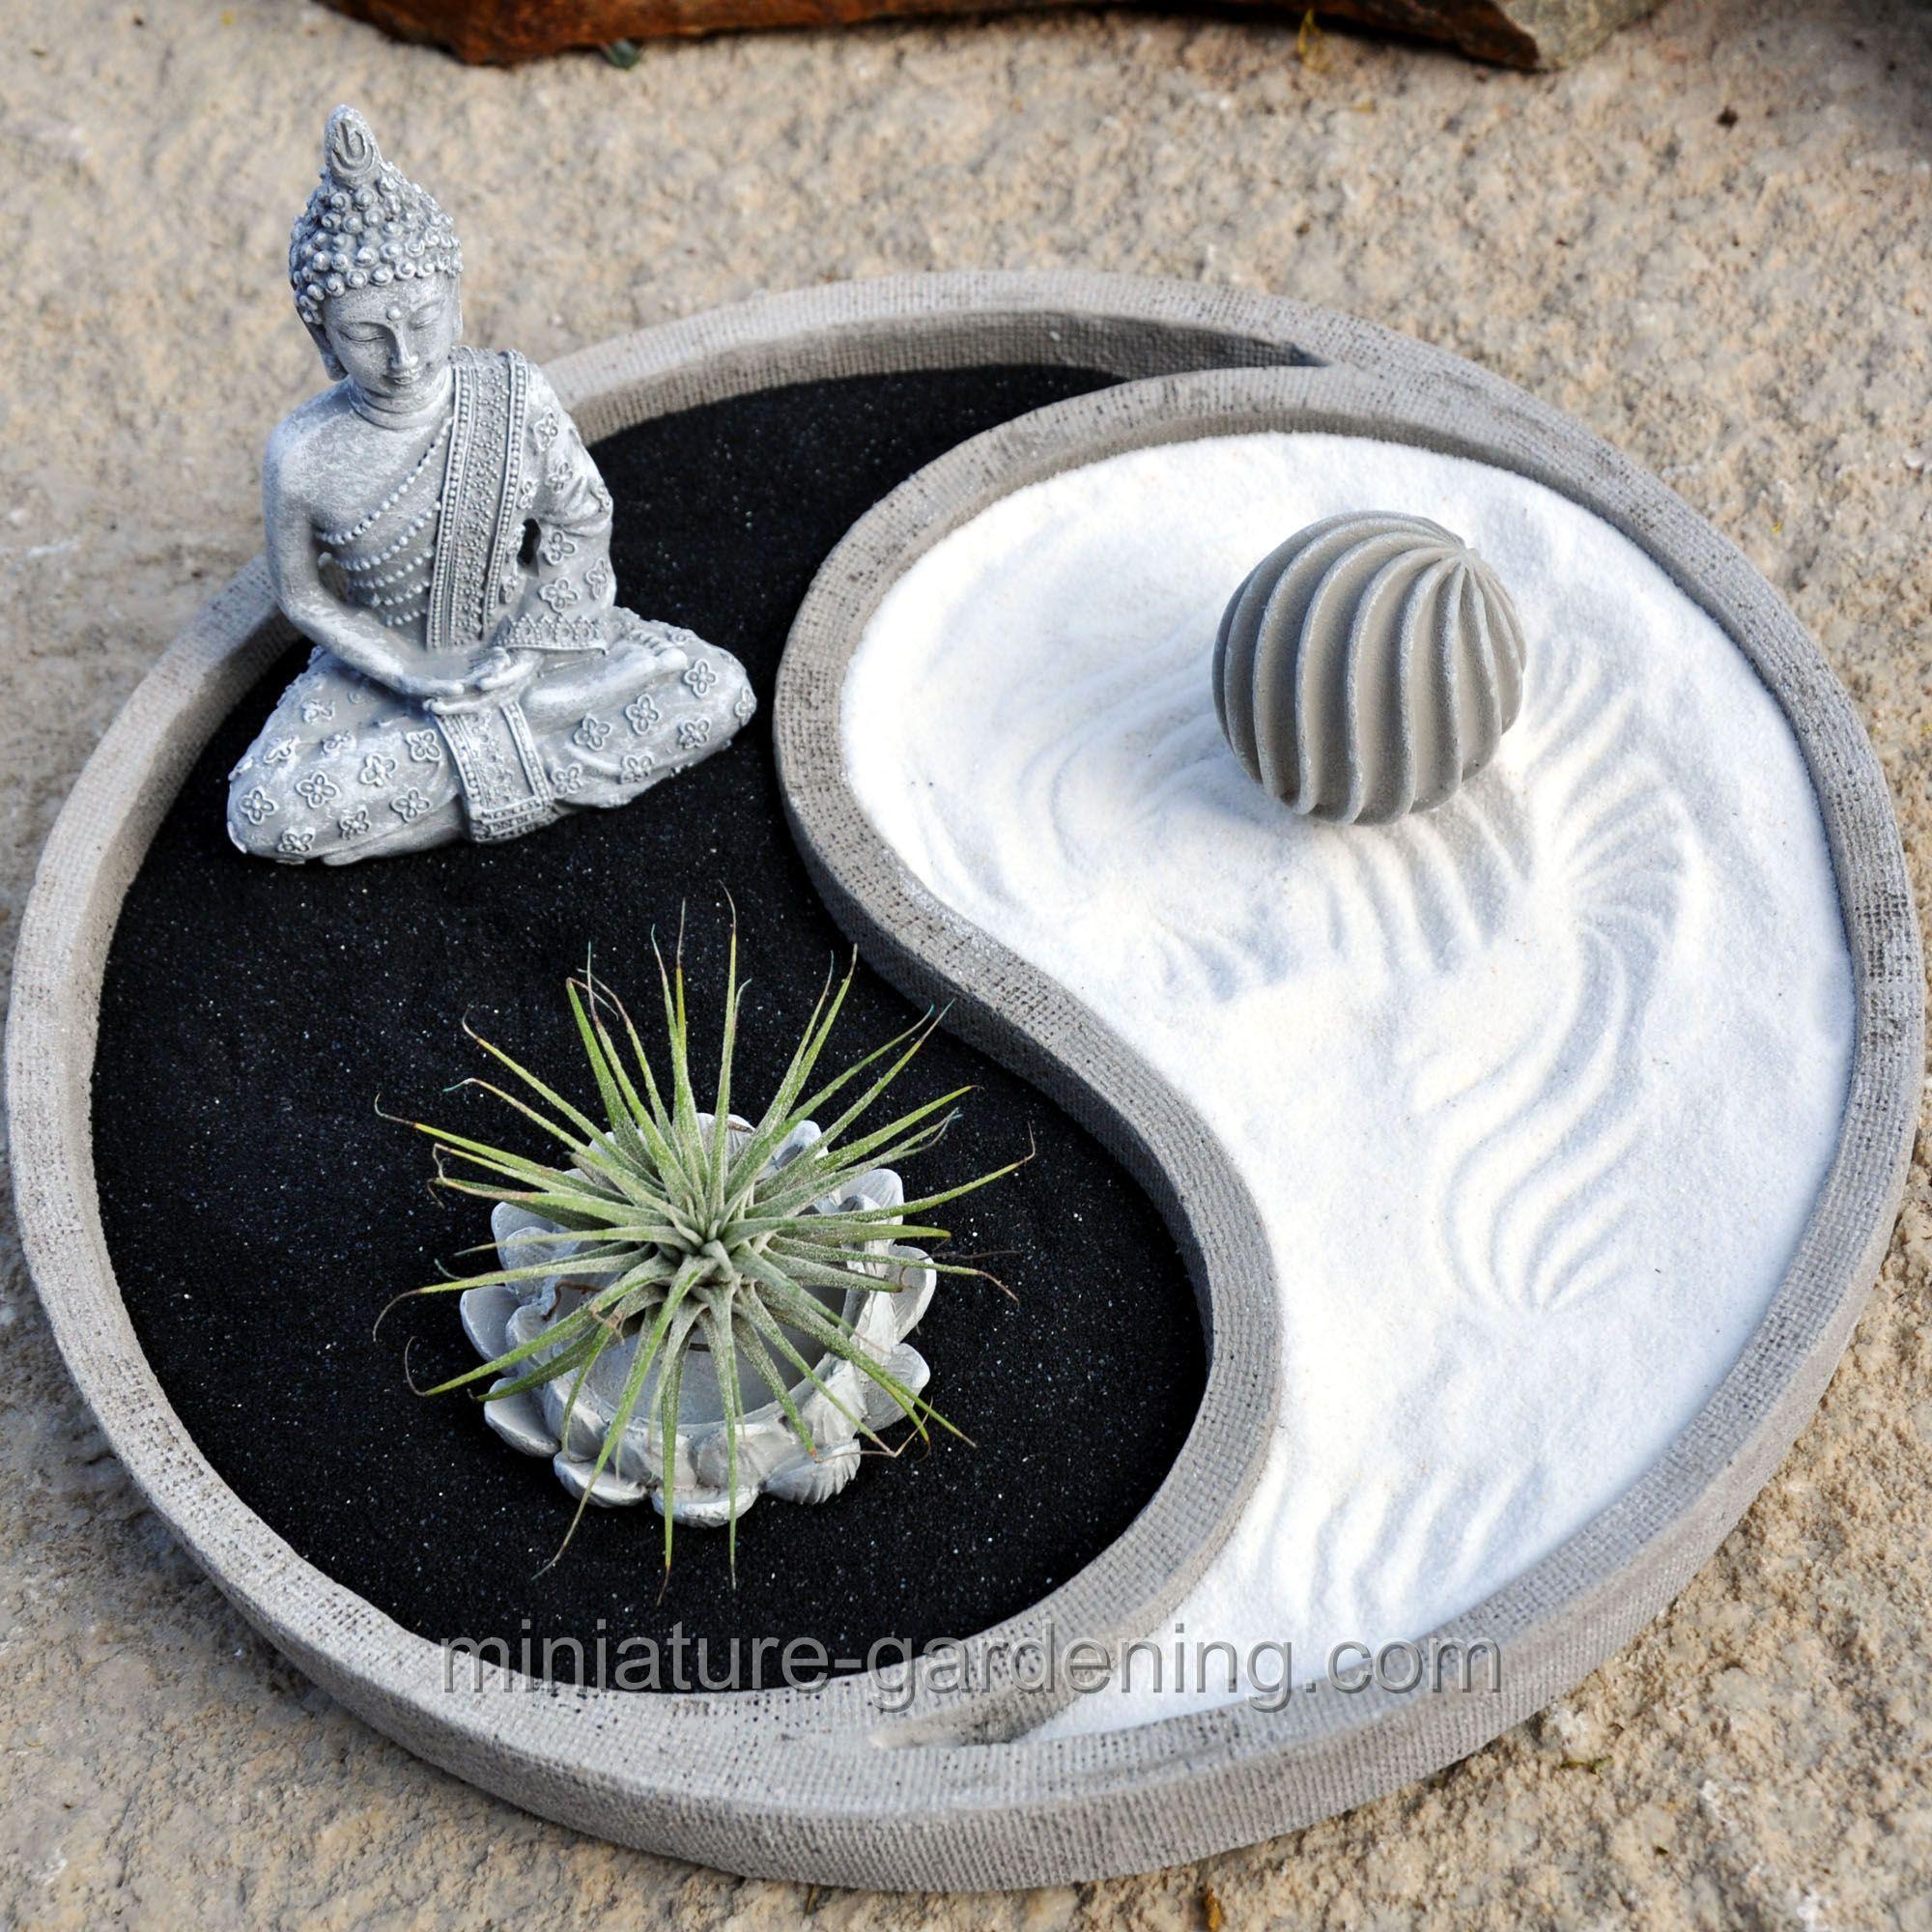 Miniature Gardening Yin Yang Cement Plate Zengardenideas